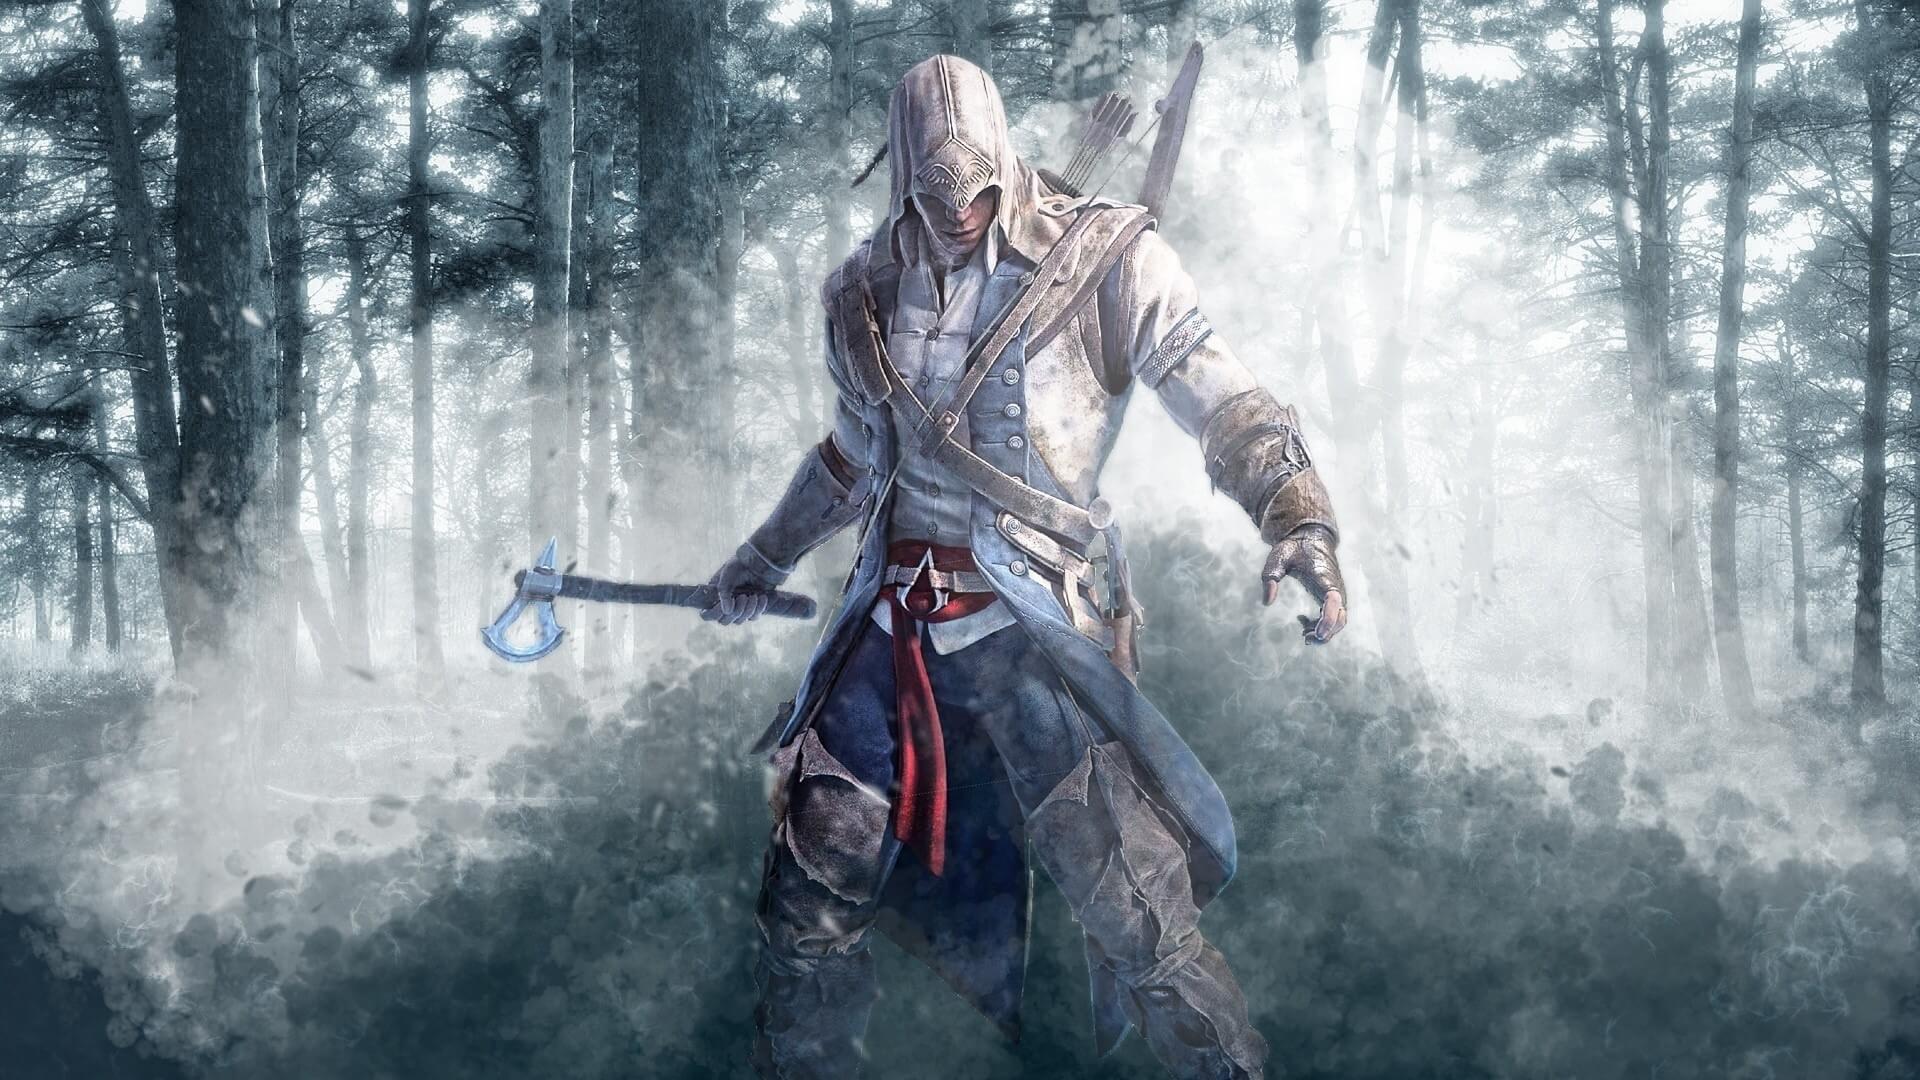 Обои и картинки Assassins creed на рабочий стол - подборка 2